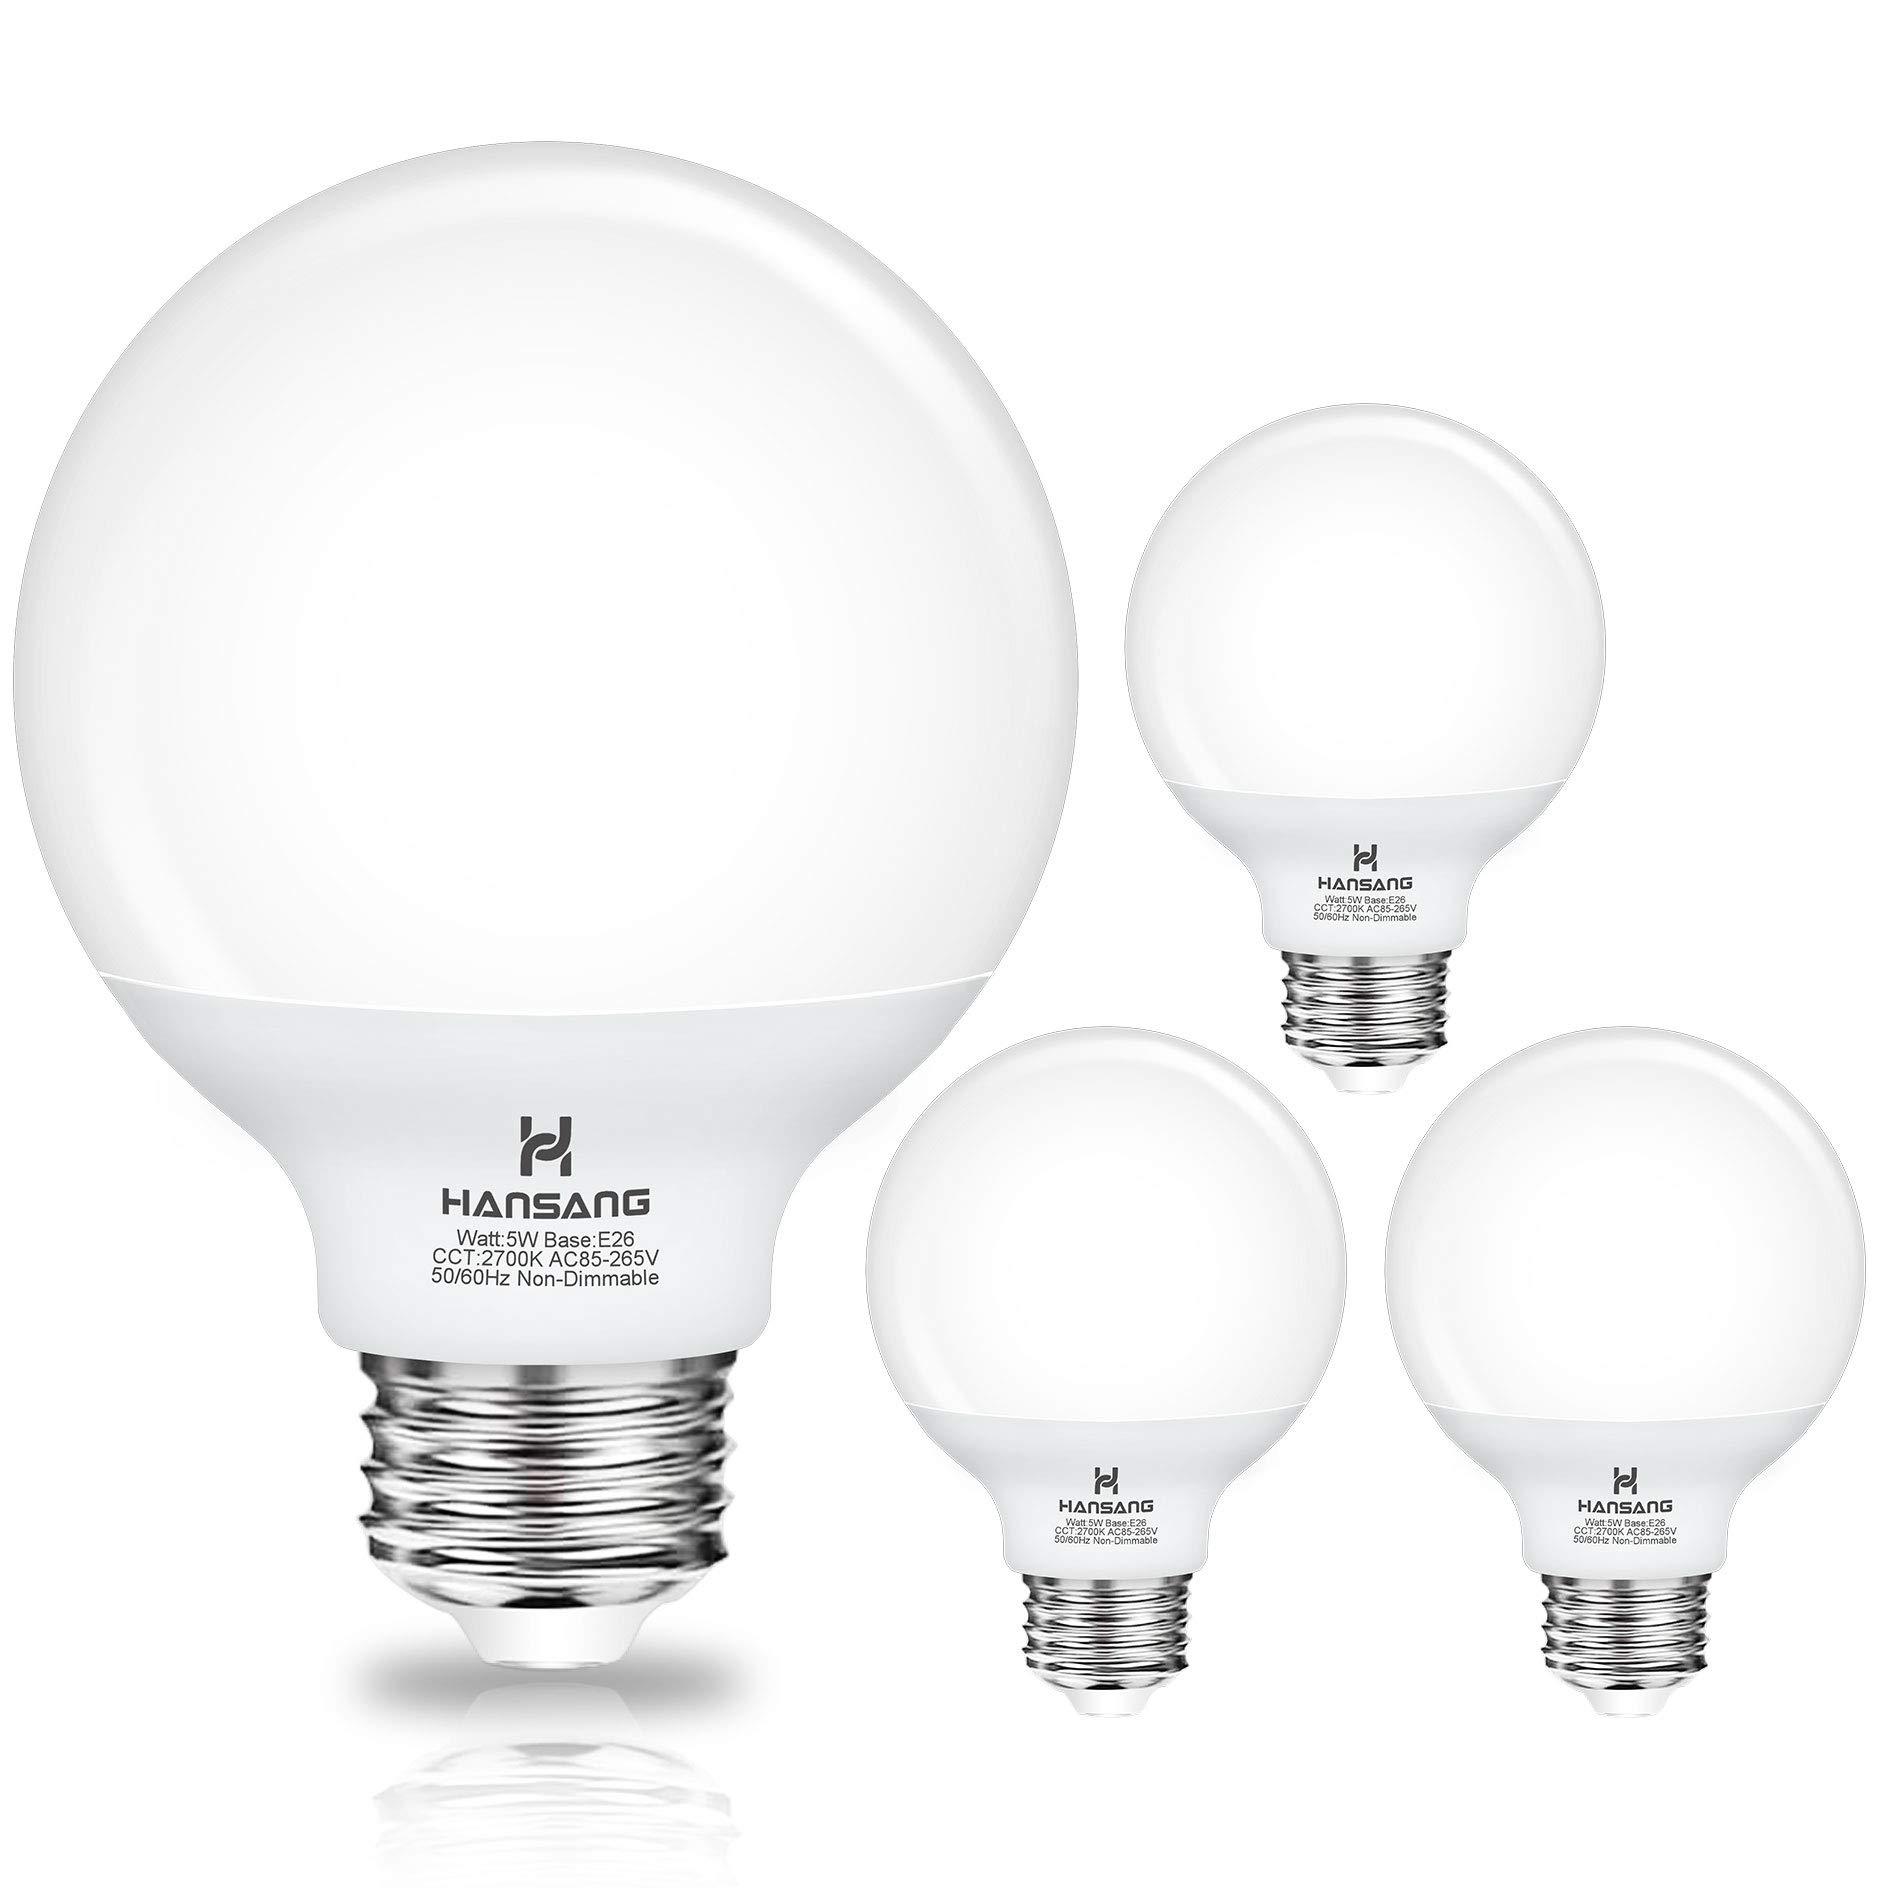 G25 LED Globe Light Bulbs, Hansang Bathroom Vanity Light Bulbs E26 Base Warm White 2700K for Bedroom Makeup Mirror Lights,60W Equivalent(5W),500LM,Non-dimmable,4Pack